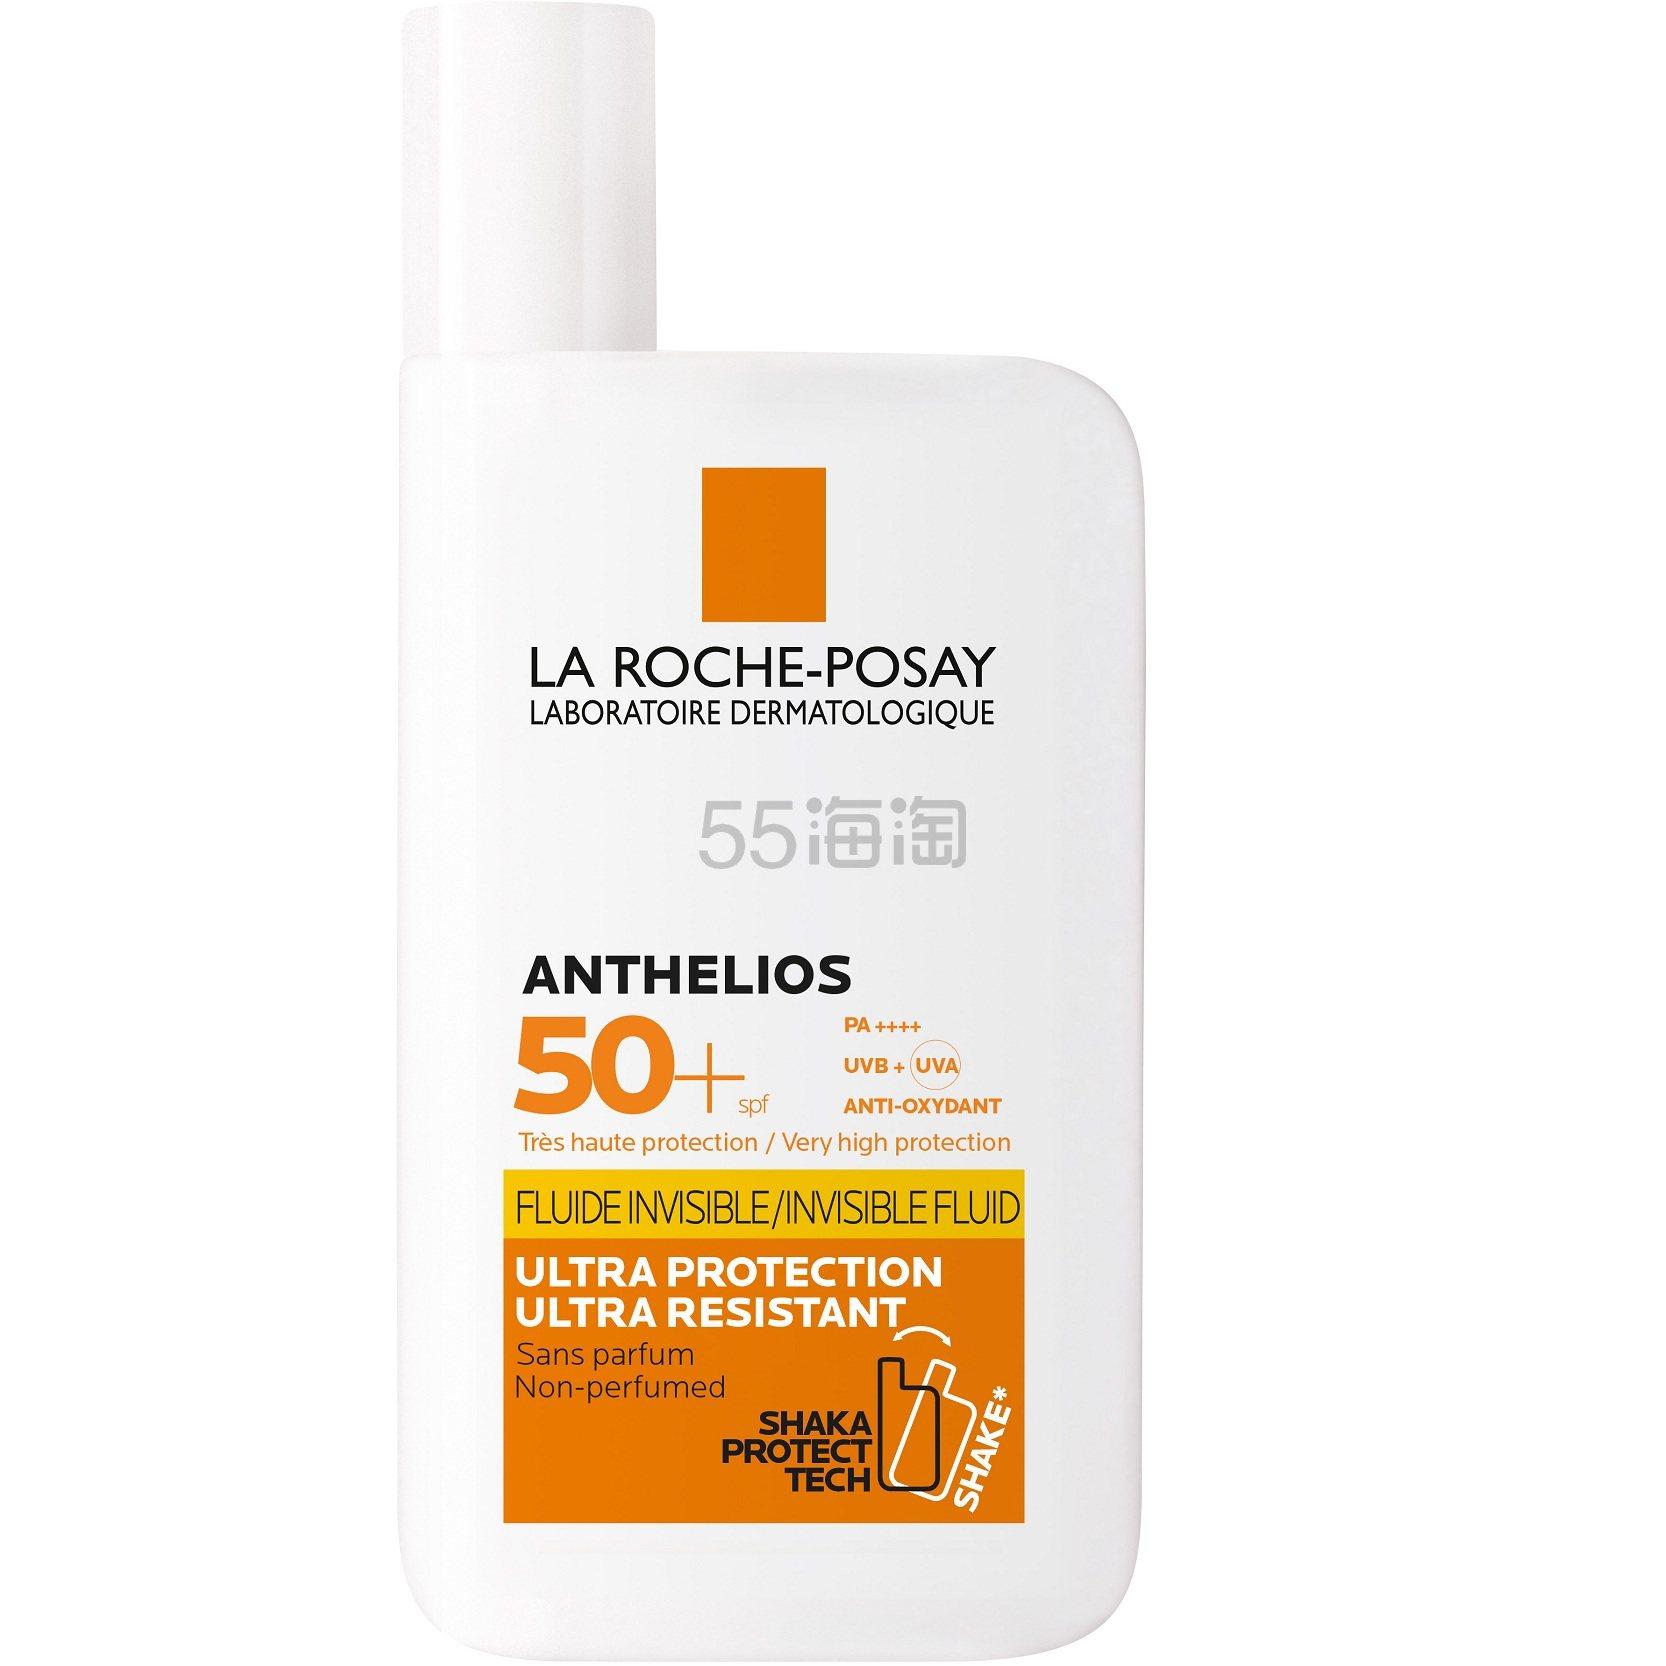 La Roche-Posay 理肤泉 大哥大轻盈防晒乳液 SPF50 50ml